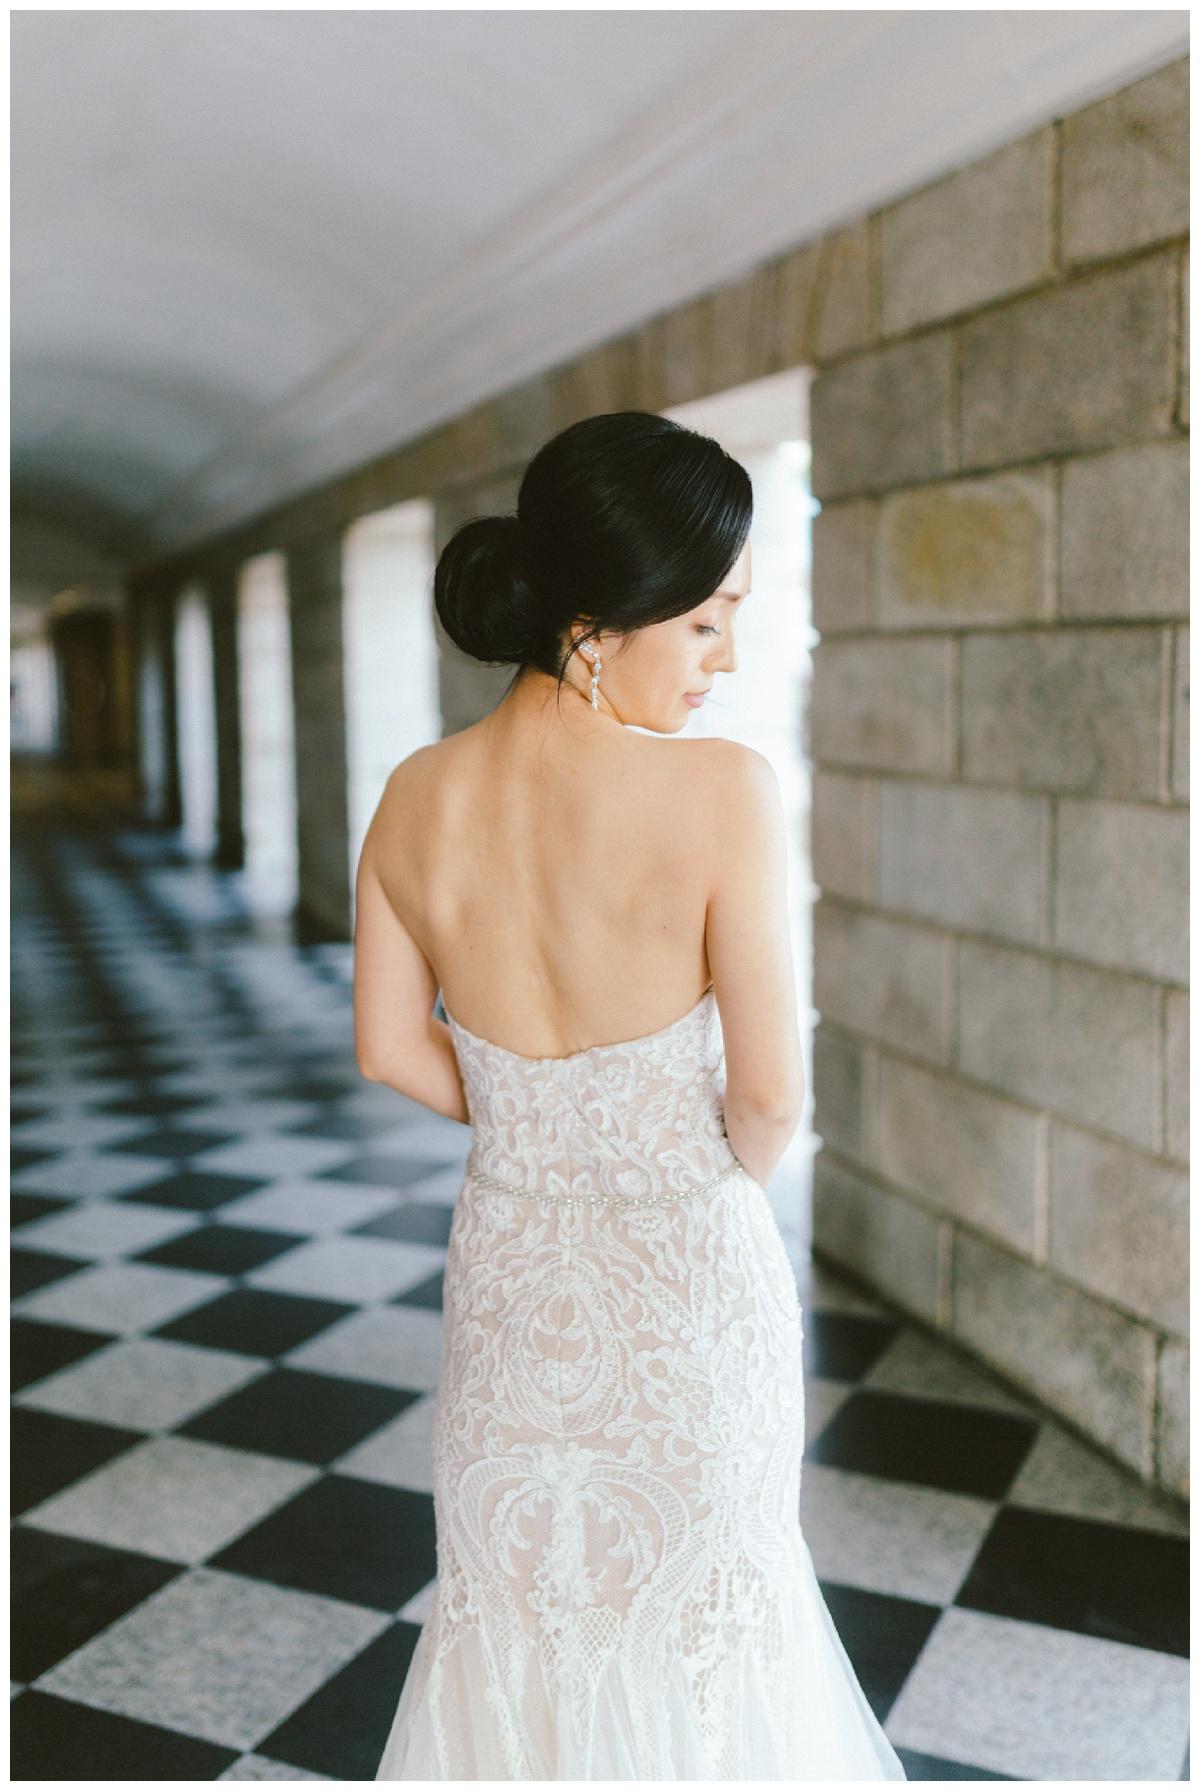 Mattie C. Fine Art Wedding Prewedding Photography Vancouver and Hong Kong 21.jpg